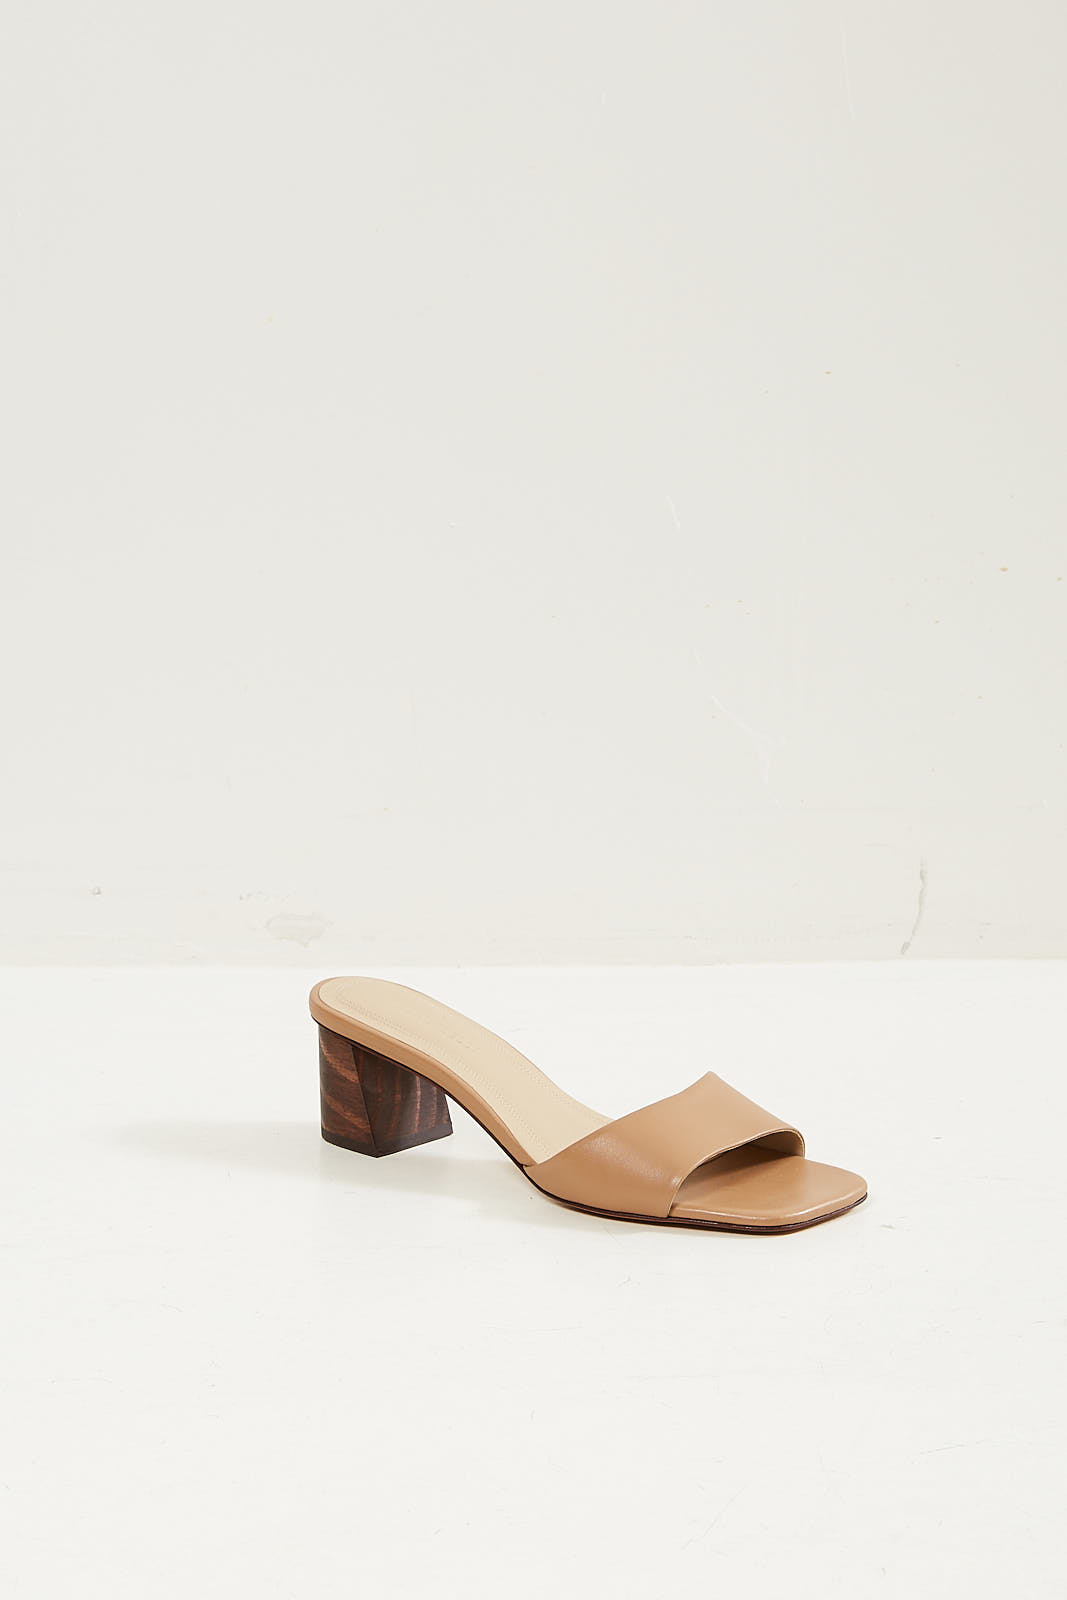 Mari Giudicelli Carmen sandal